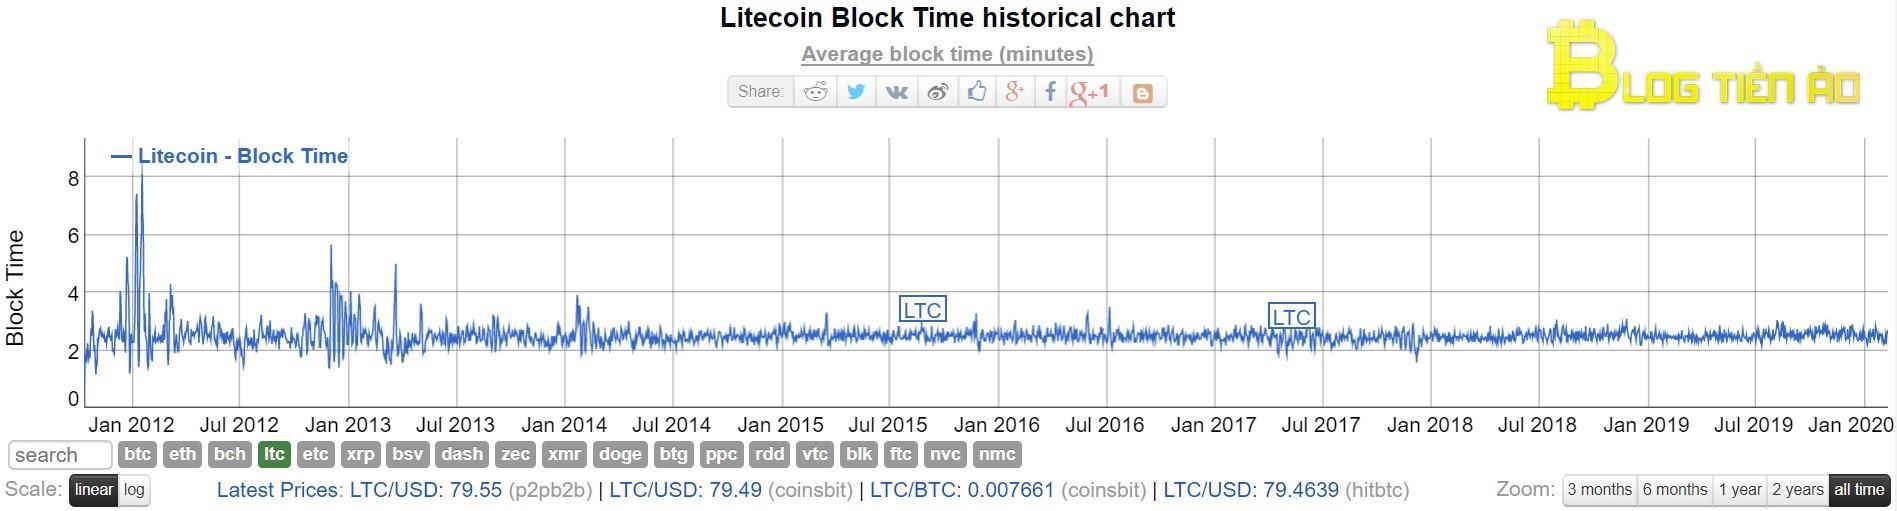 thời gian tạo khối của Litecoin